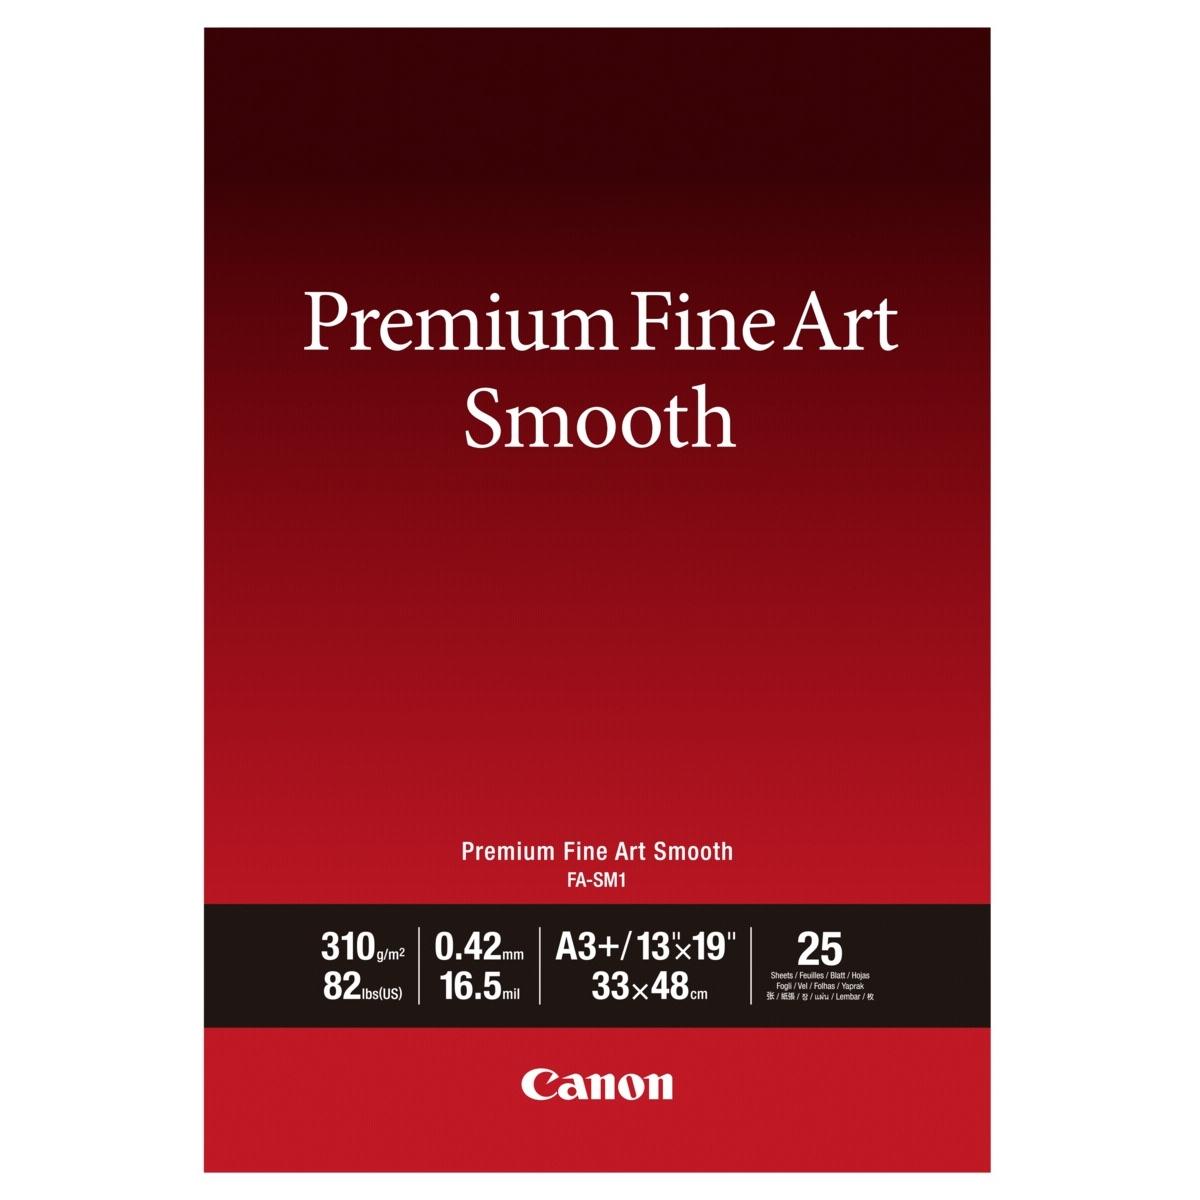 Original Canon FA-SM1 310gsm Premium Fine Art Smooth A3+ Cotton Matte Photo Paper - 25 Sheets (1711C004)